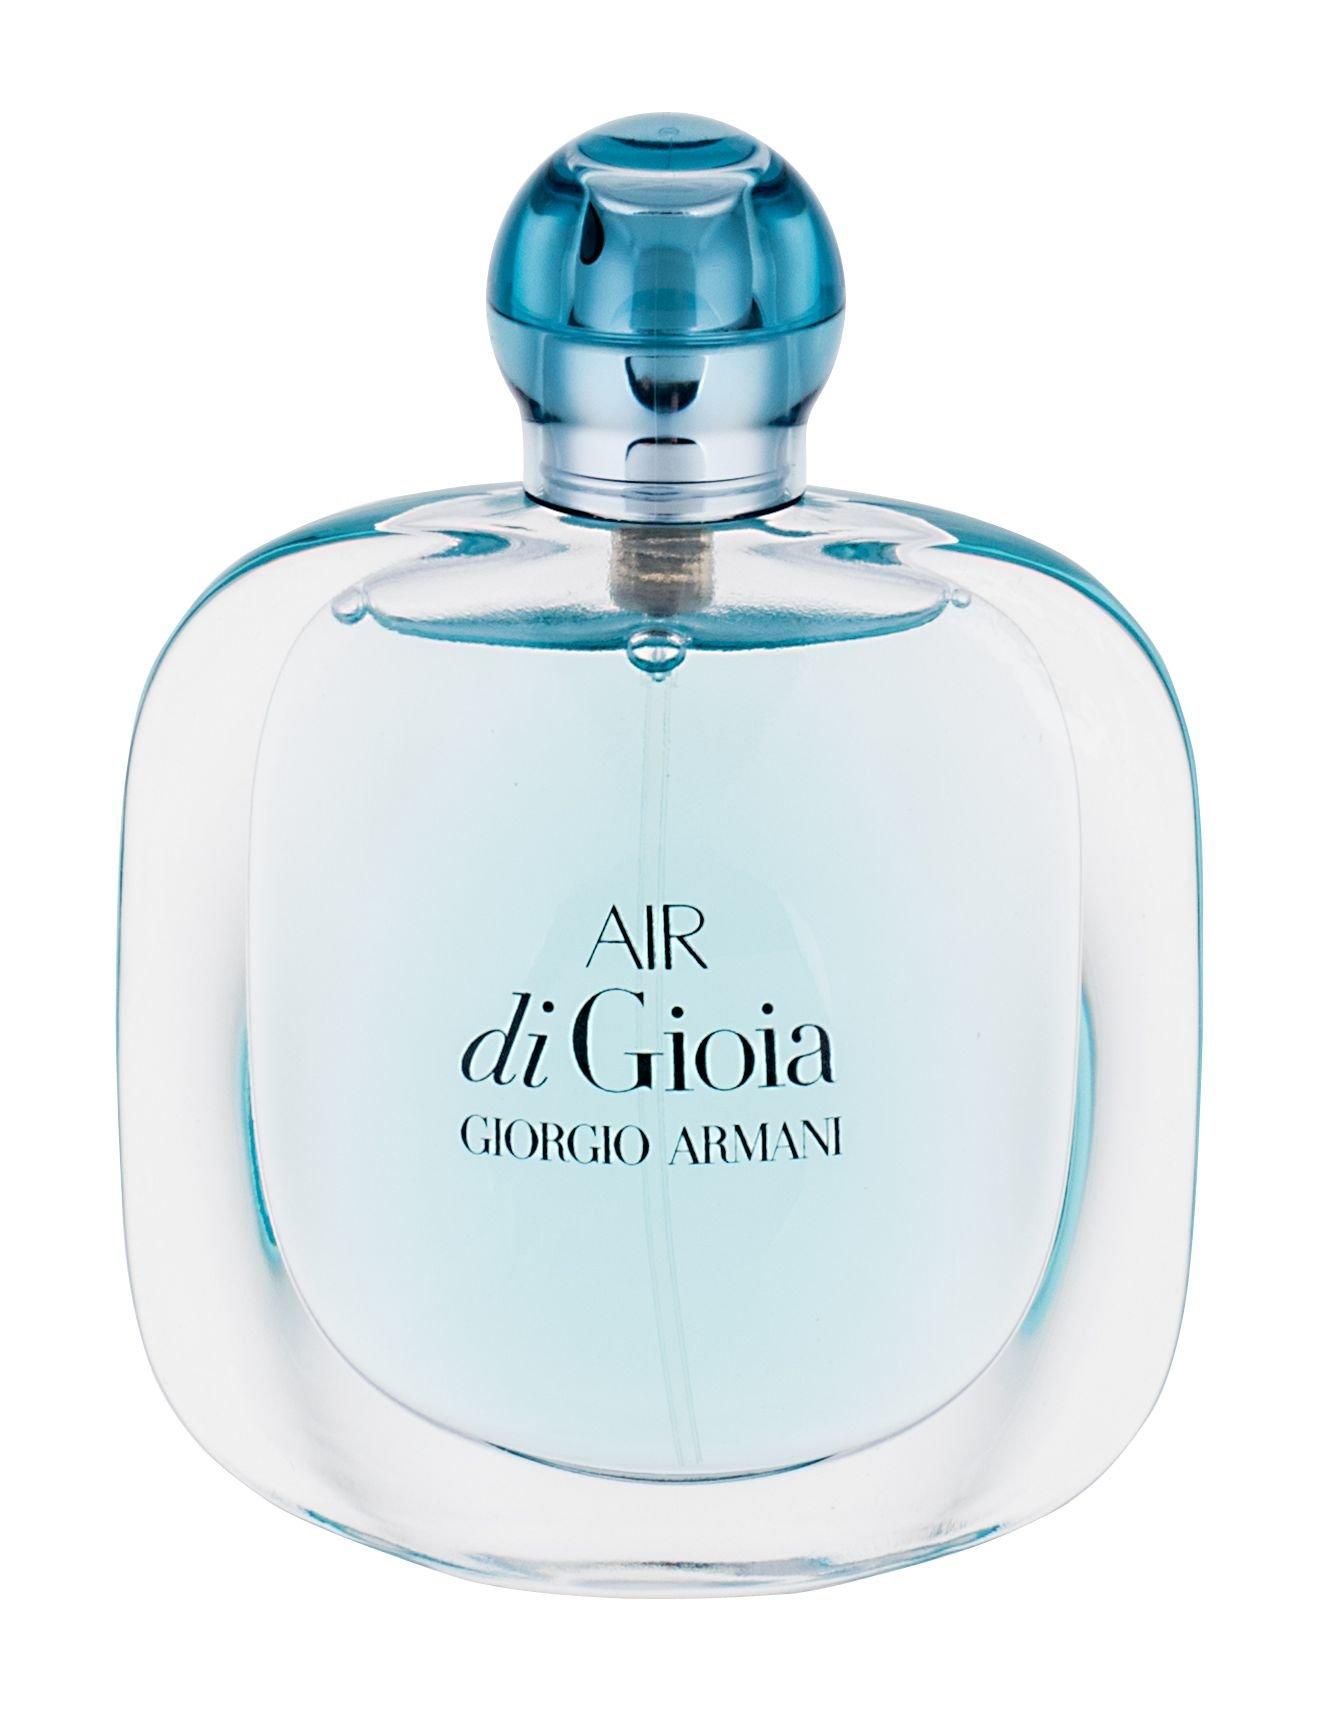 Giorgio Armani Air di Gioia, Parfumovaná voda 15ml